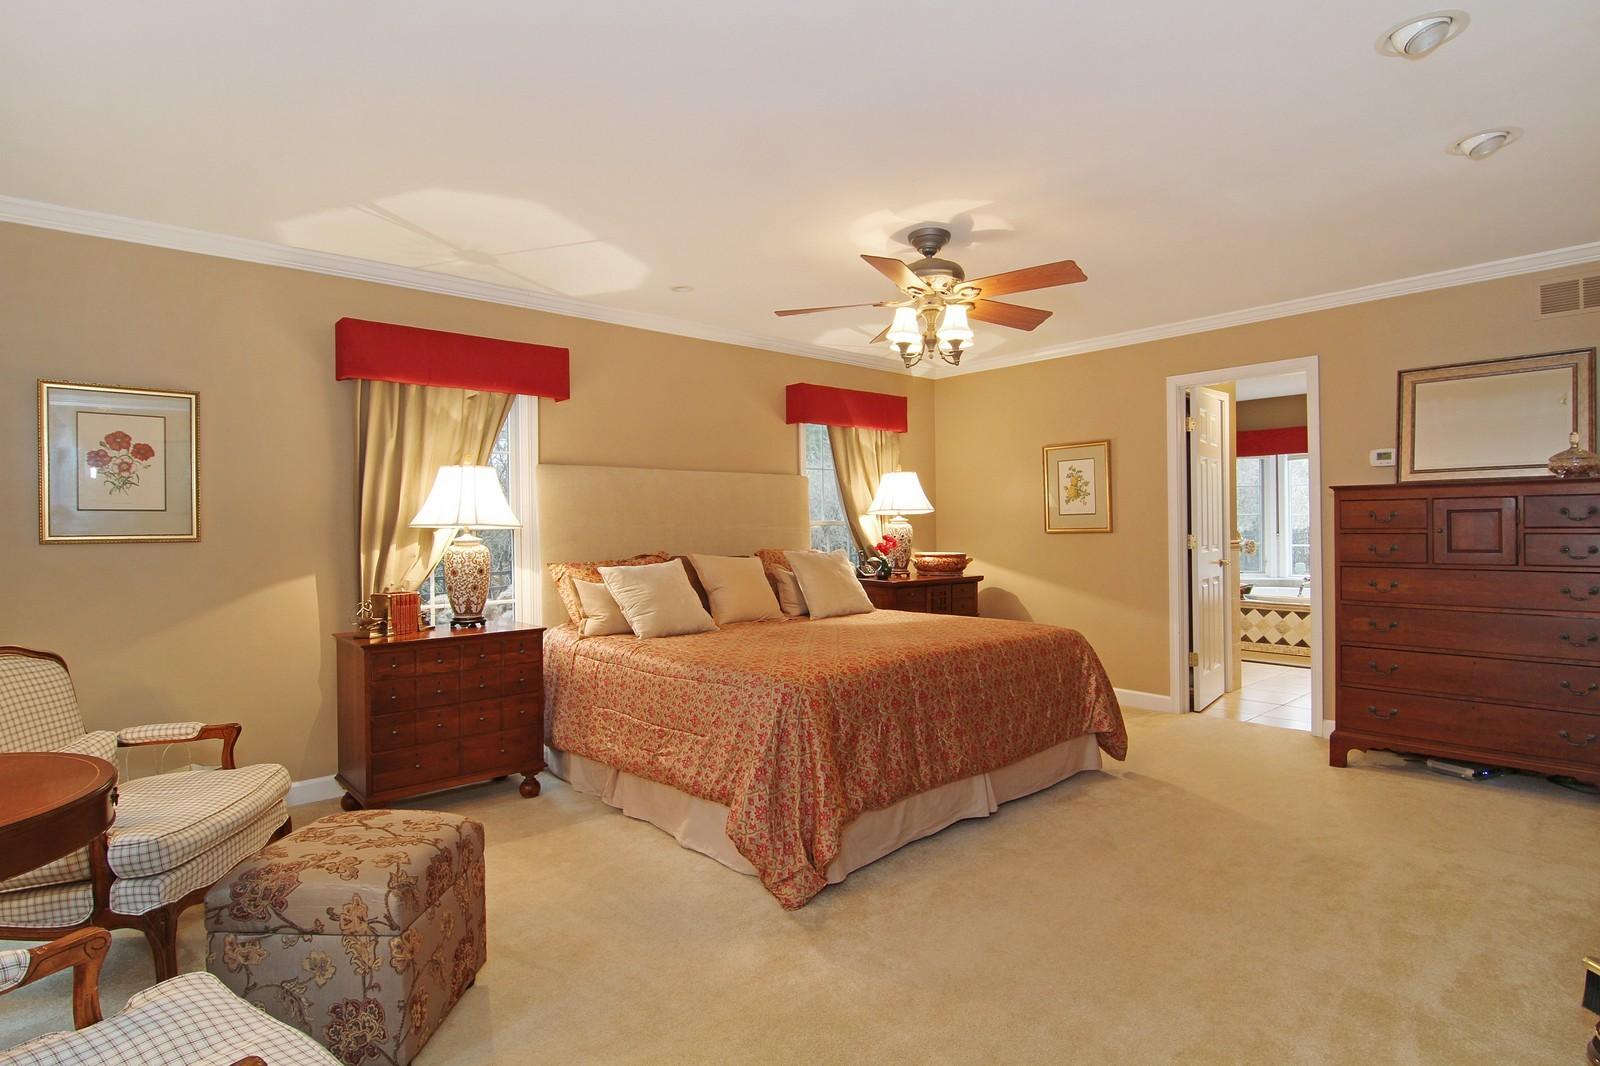 Real Estate Photography - 700 Peck Road, Geneva, IL, 60134 - Master Bedroom